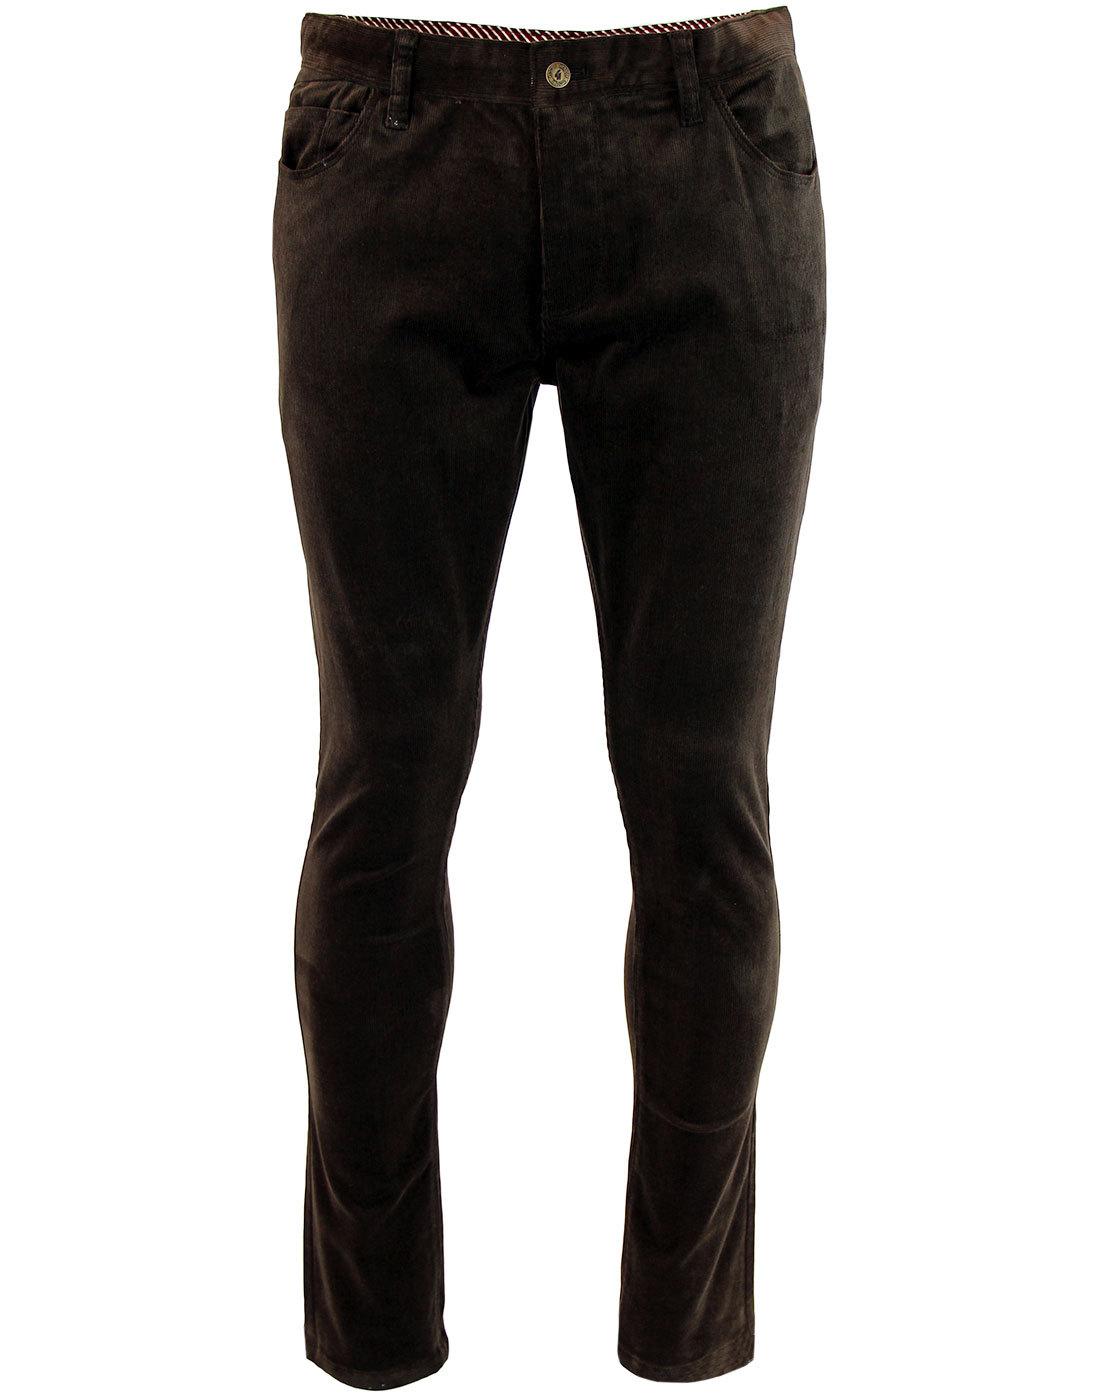 GABICCI VINTAGE Retro Mod Slim Leg Cord Trousers